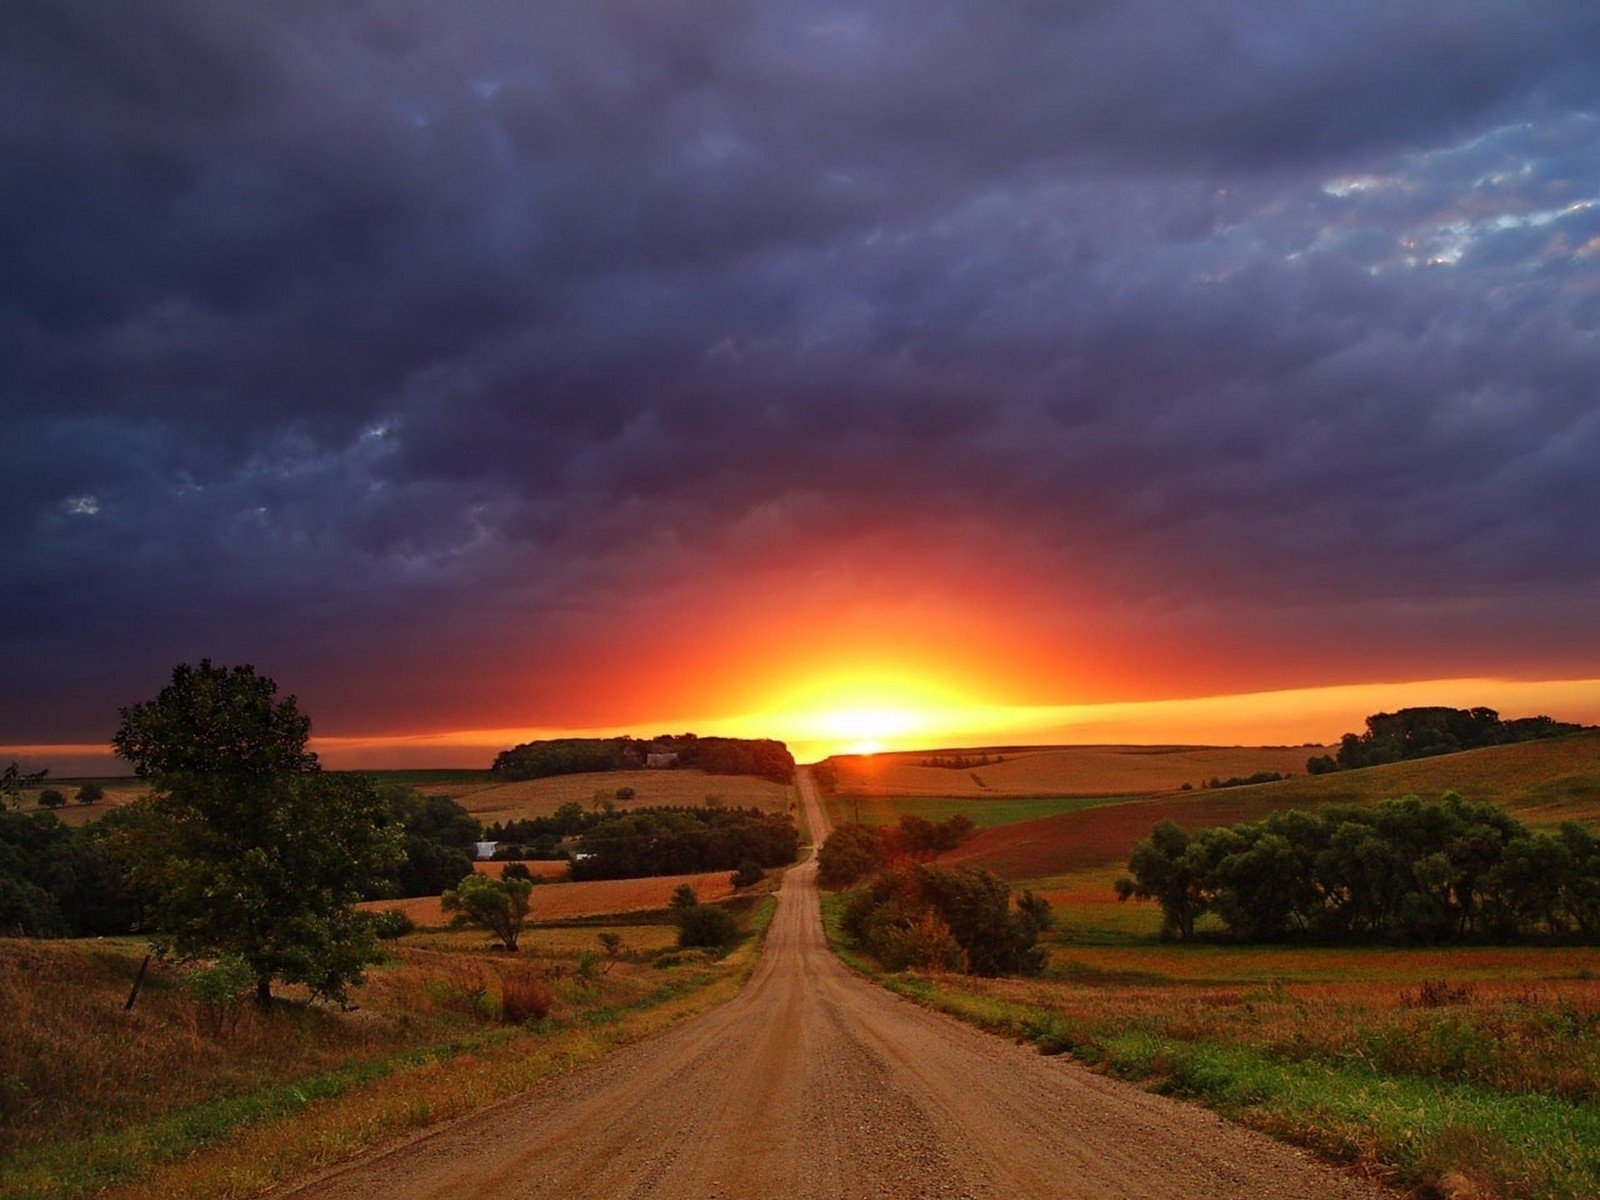 Sunset Road Papel De Parede And Planos De Fundo 1600x1200 Id 686557 Wallpaper Abyss